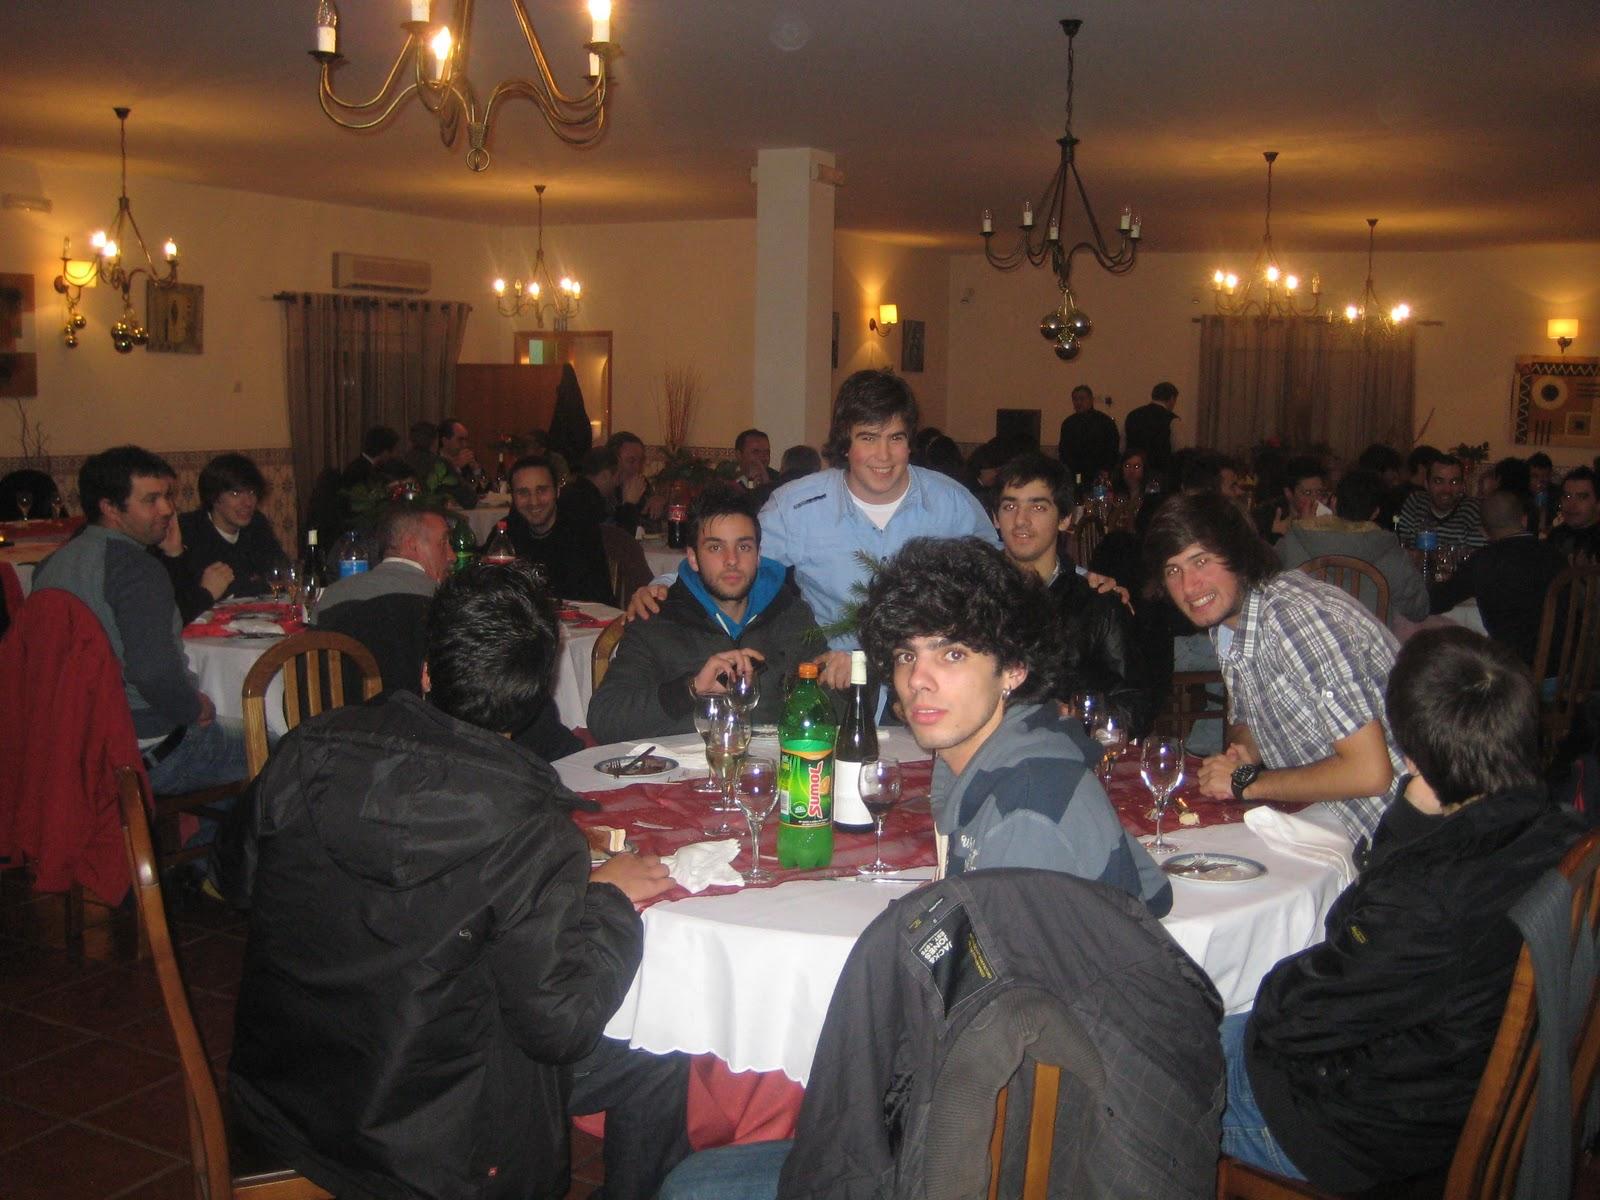 Futsal Júnior Masculino C.D.Aves: Jantar de Natal C.D.Aves Futsal #9F672C 1600x1200